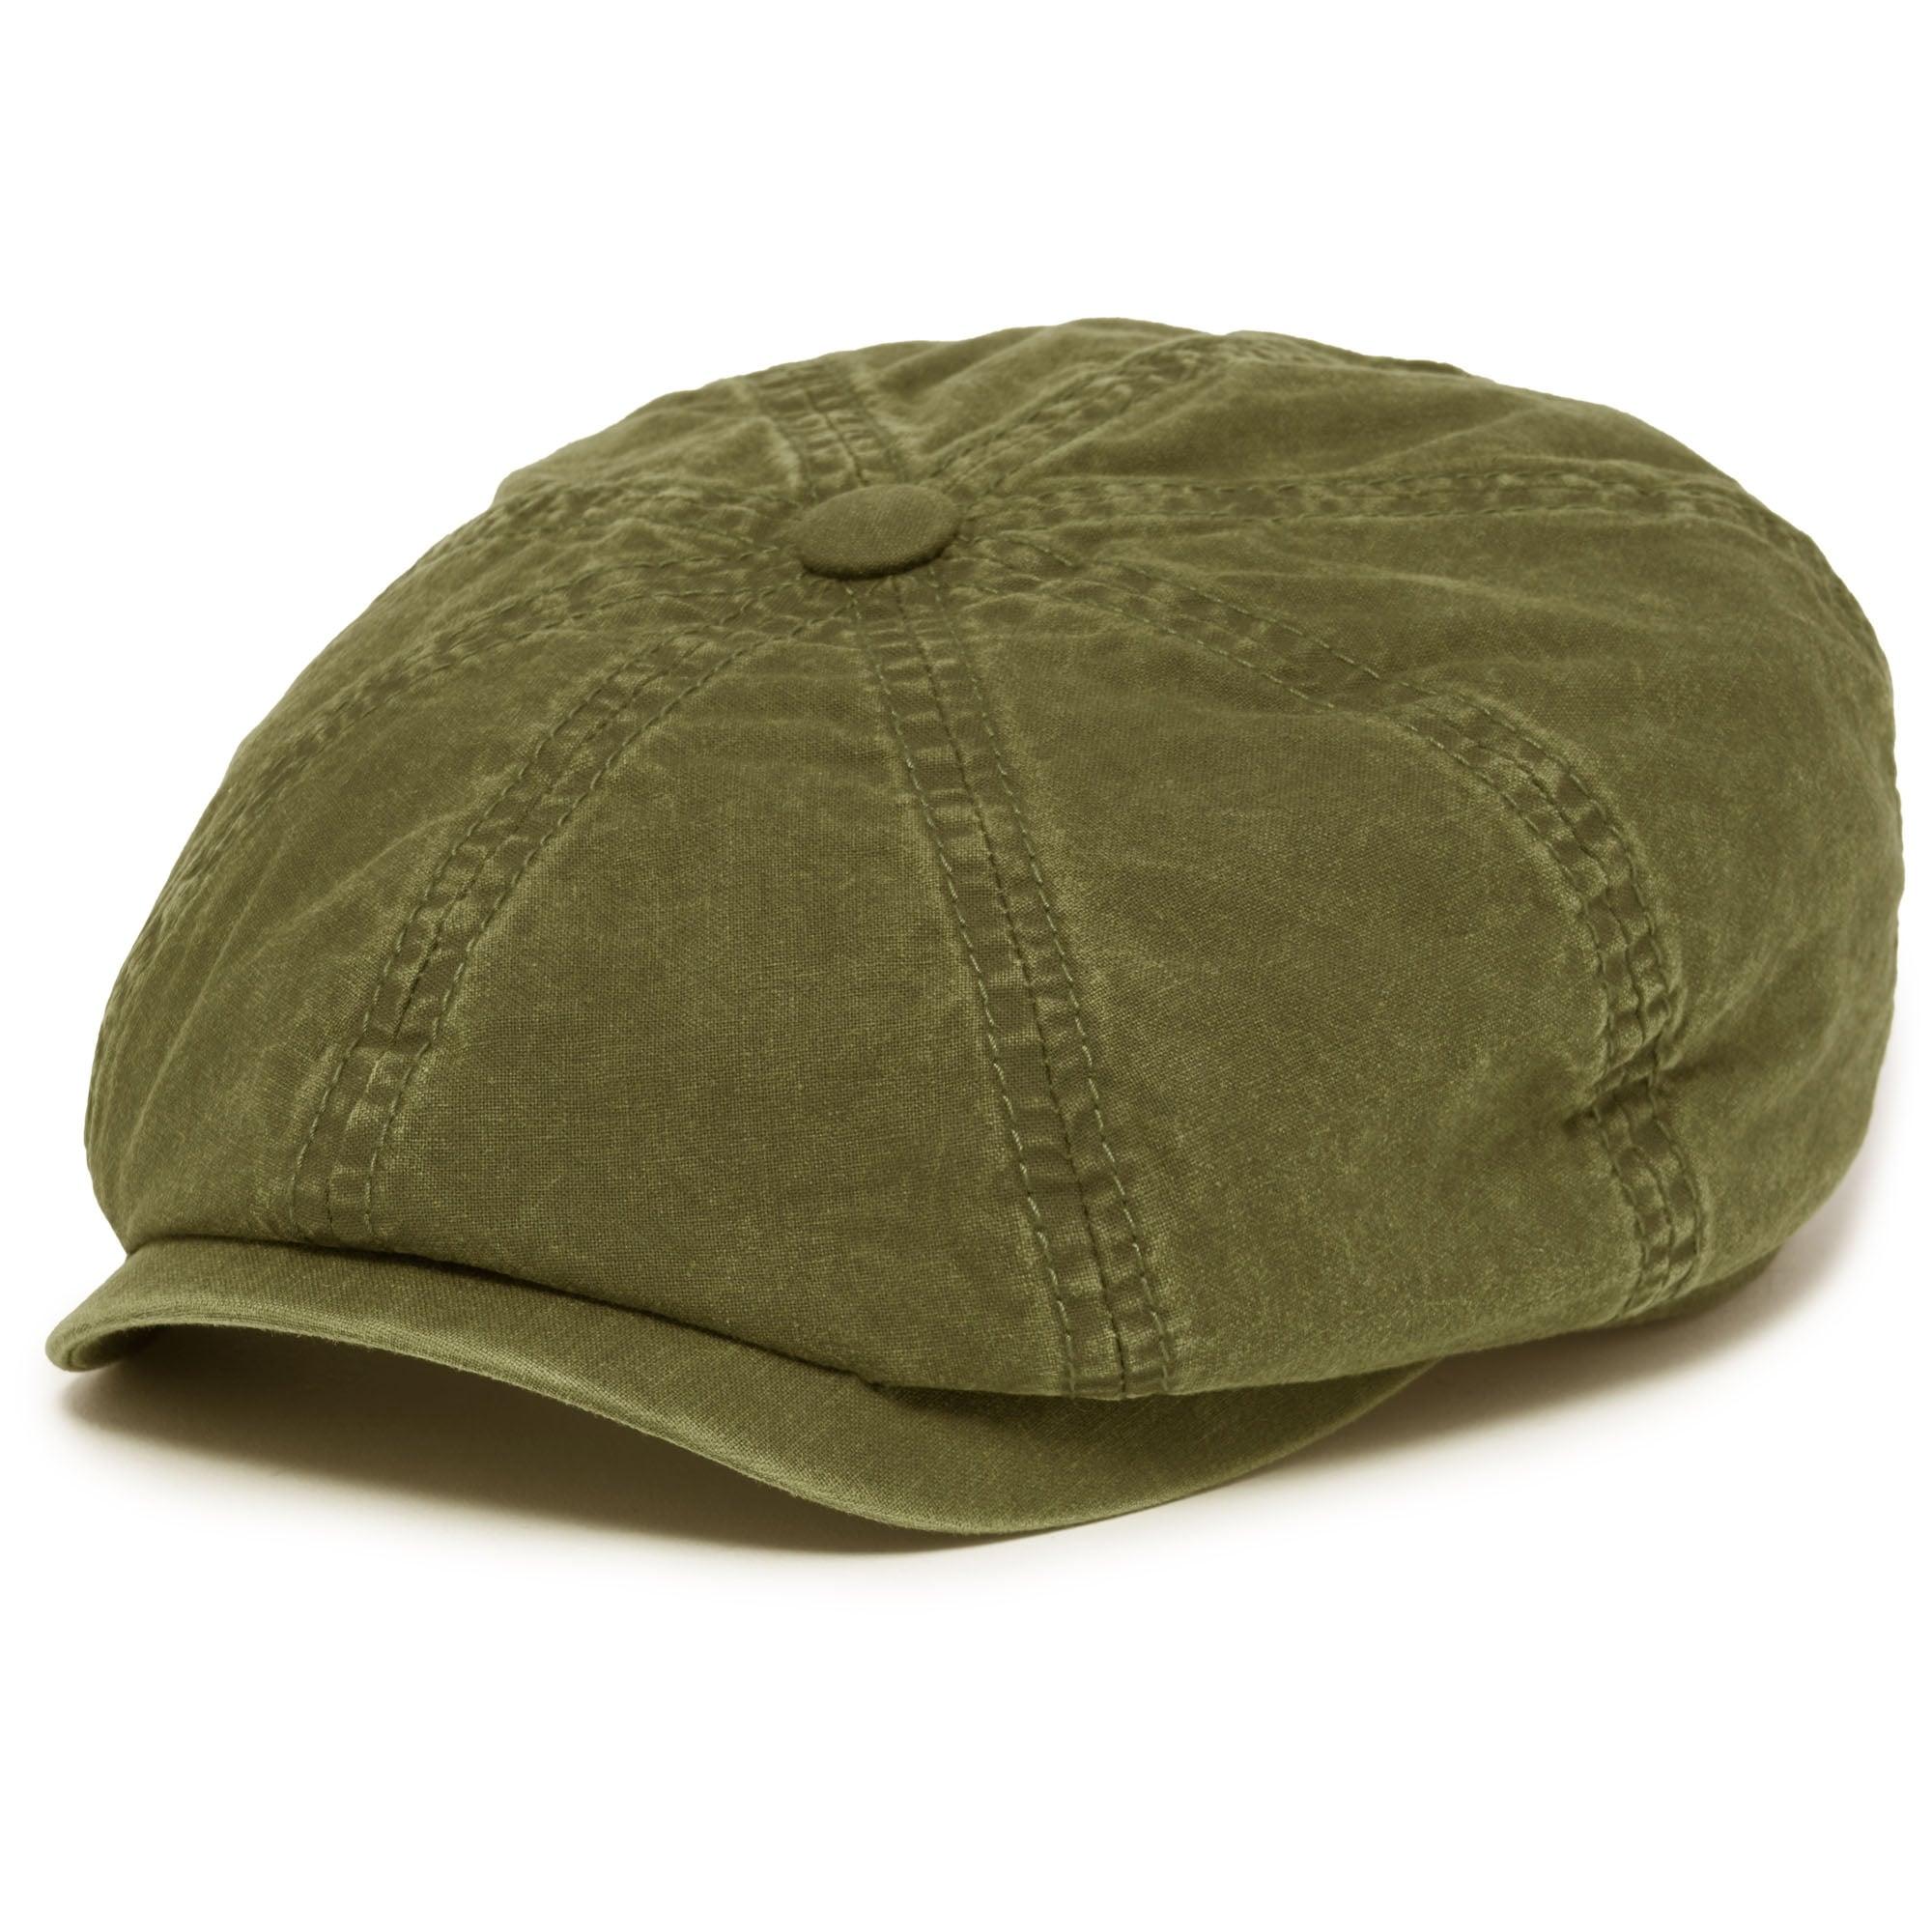 658665ee5ad28 Hatteras Delave Cotton Flat Cap- Khaki